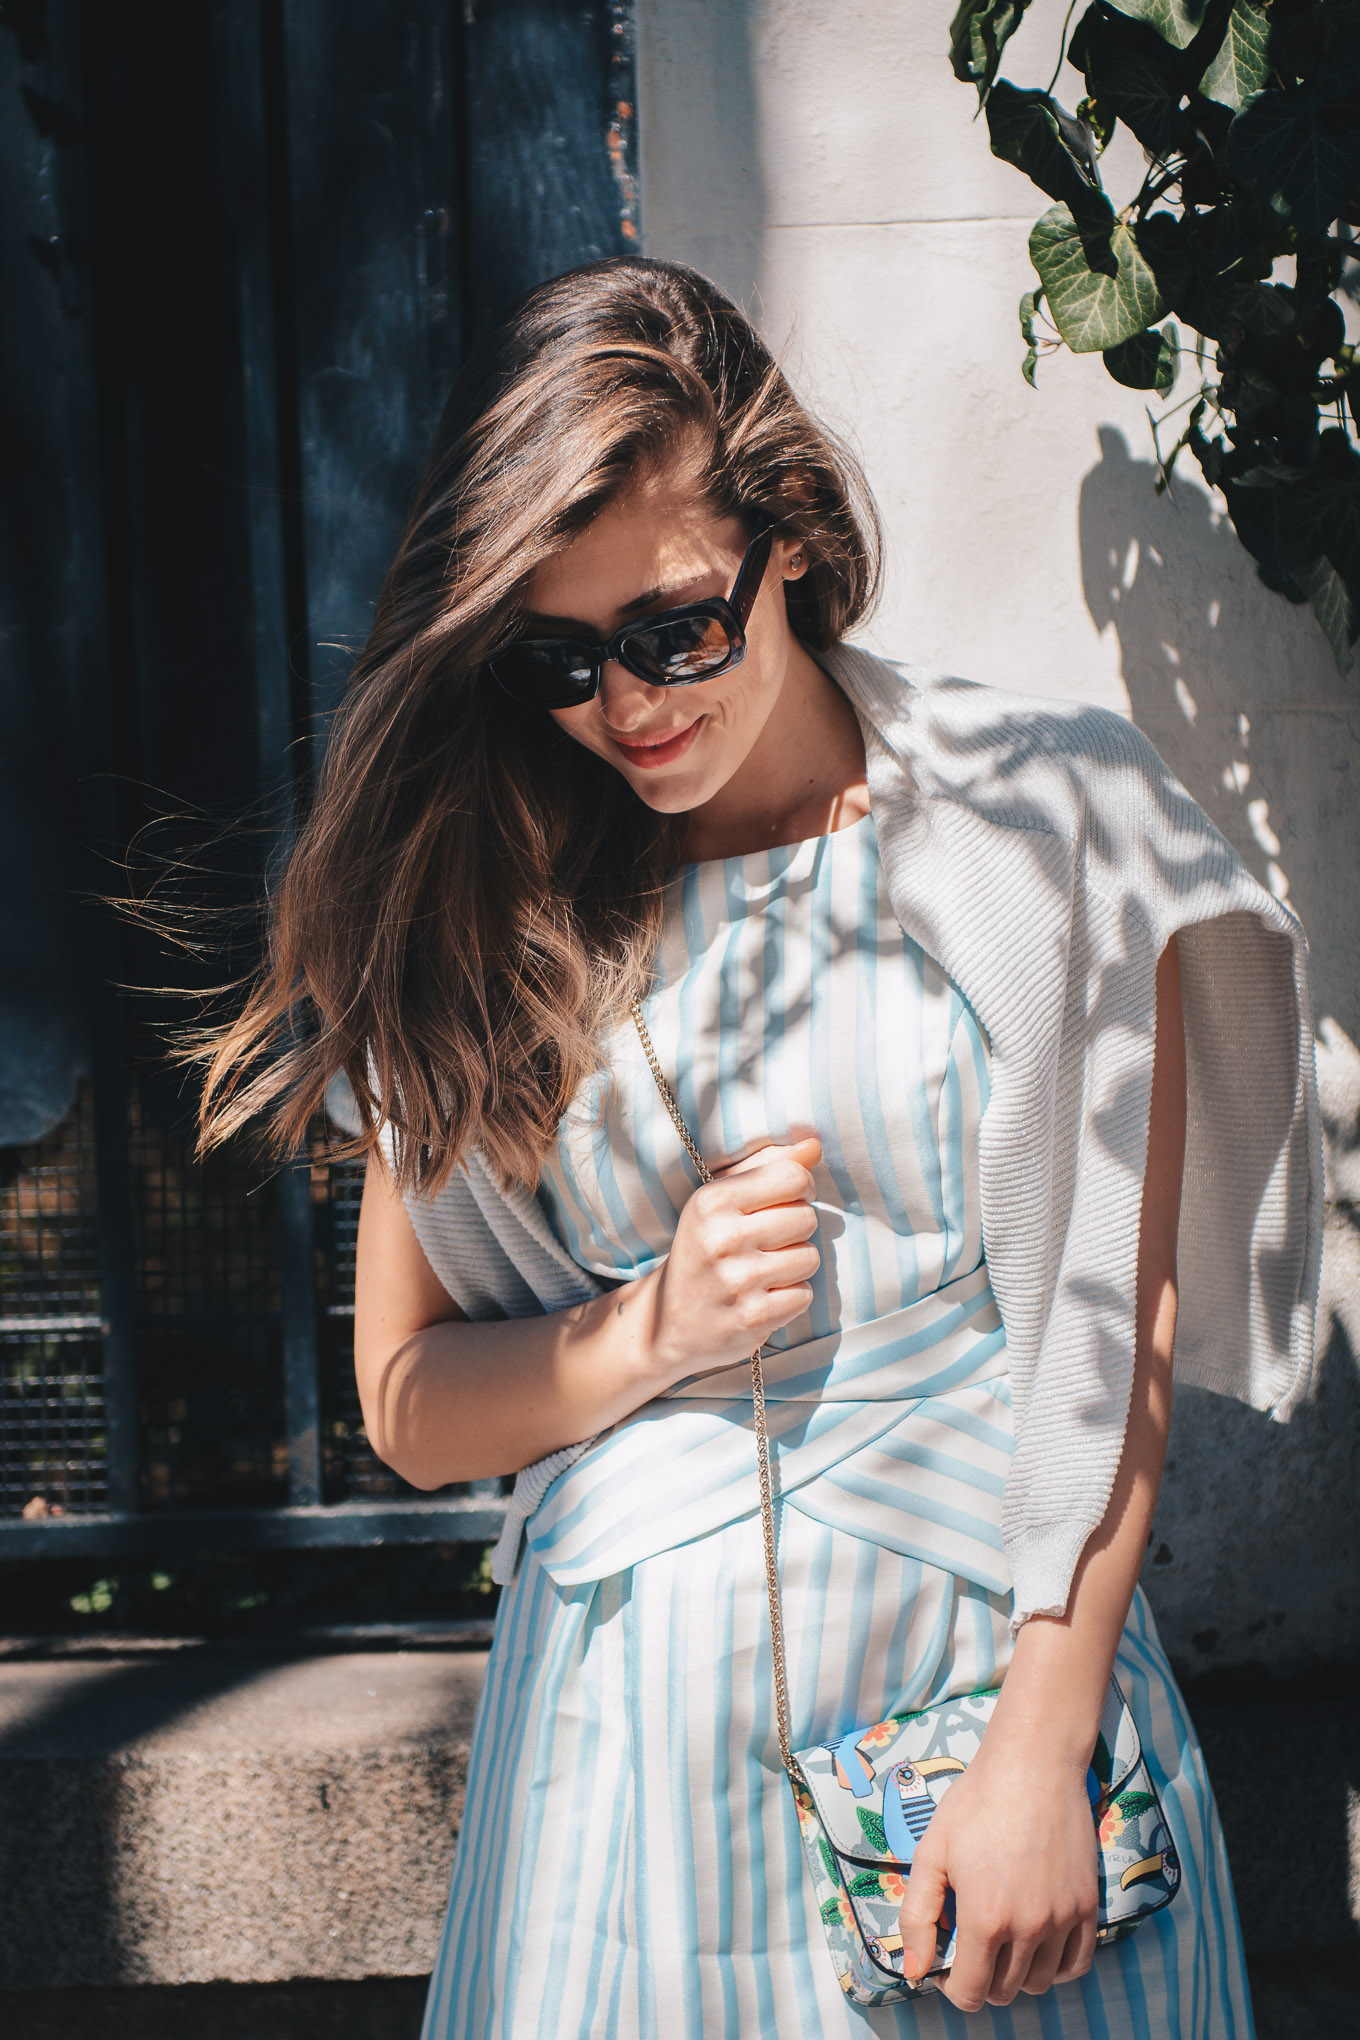 Bulgarian fashion blogger DM